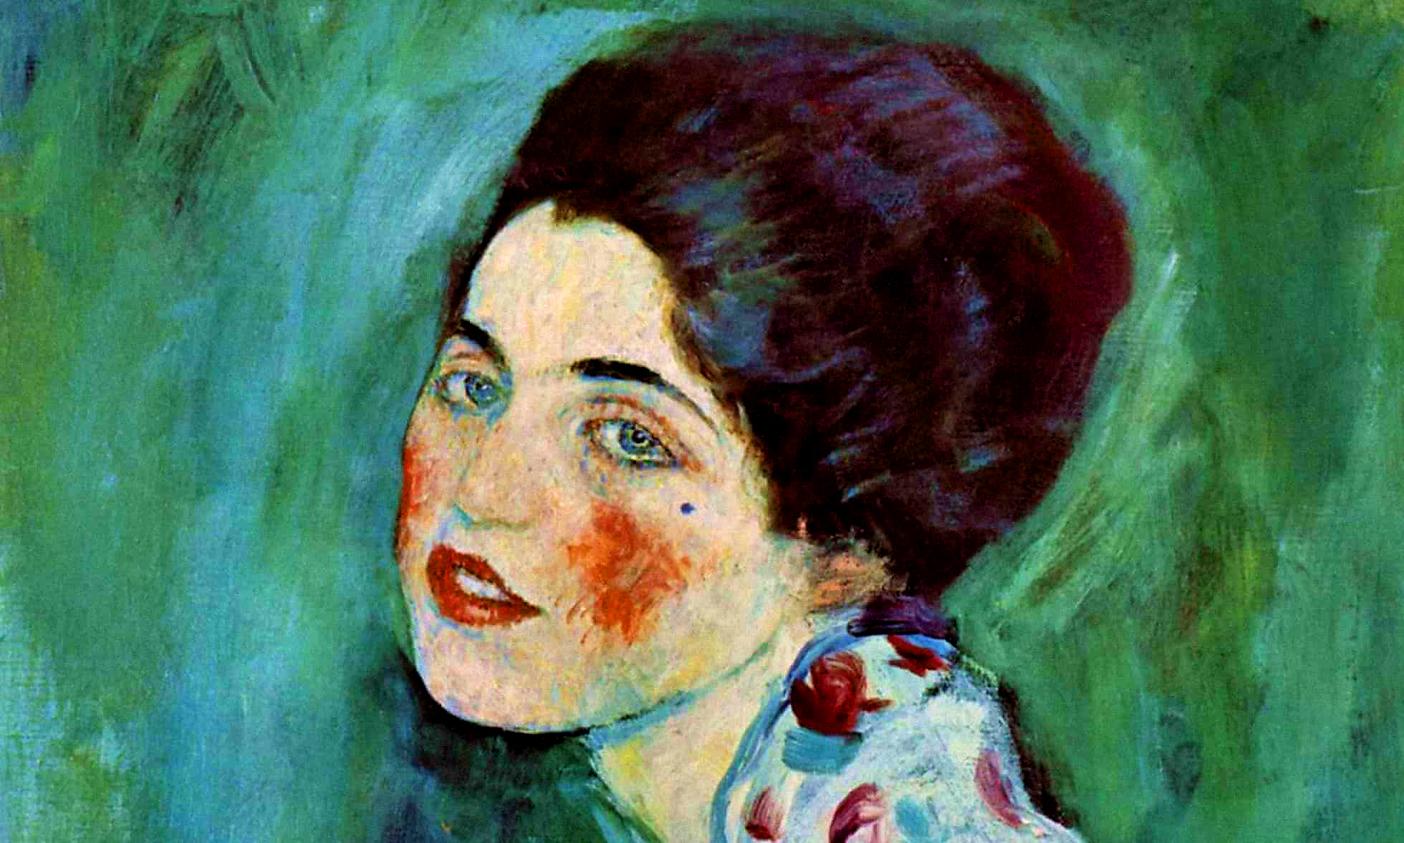 The art heists that shook the world. Image: Gustav Klimt's Portrait of a Lady. Image Credit: Stephen Barnes /Religion / Alamy, 2020.